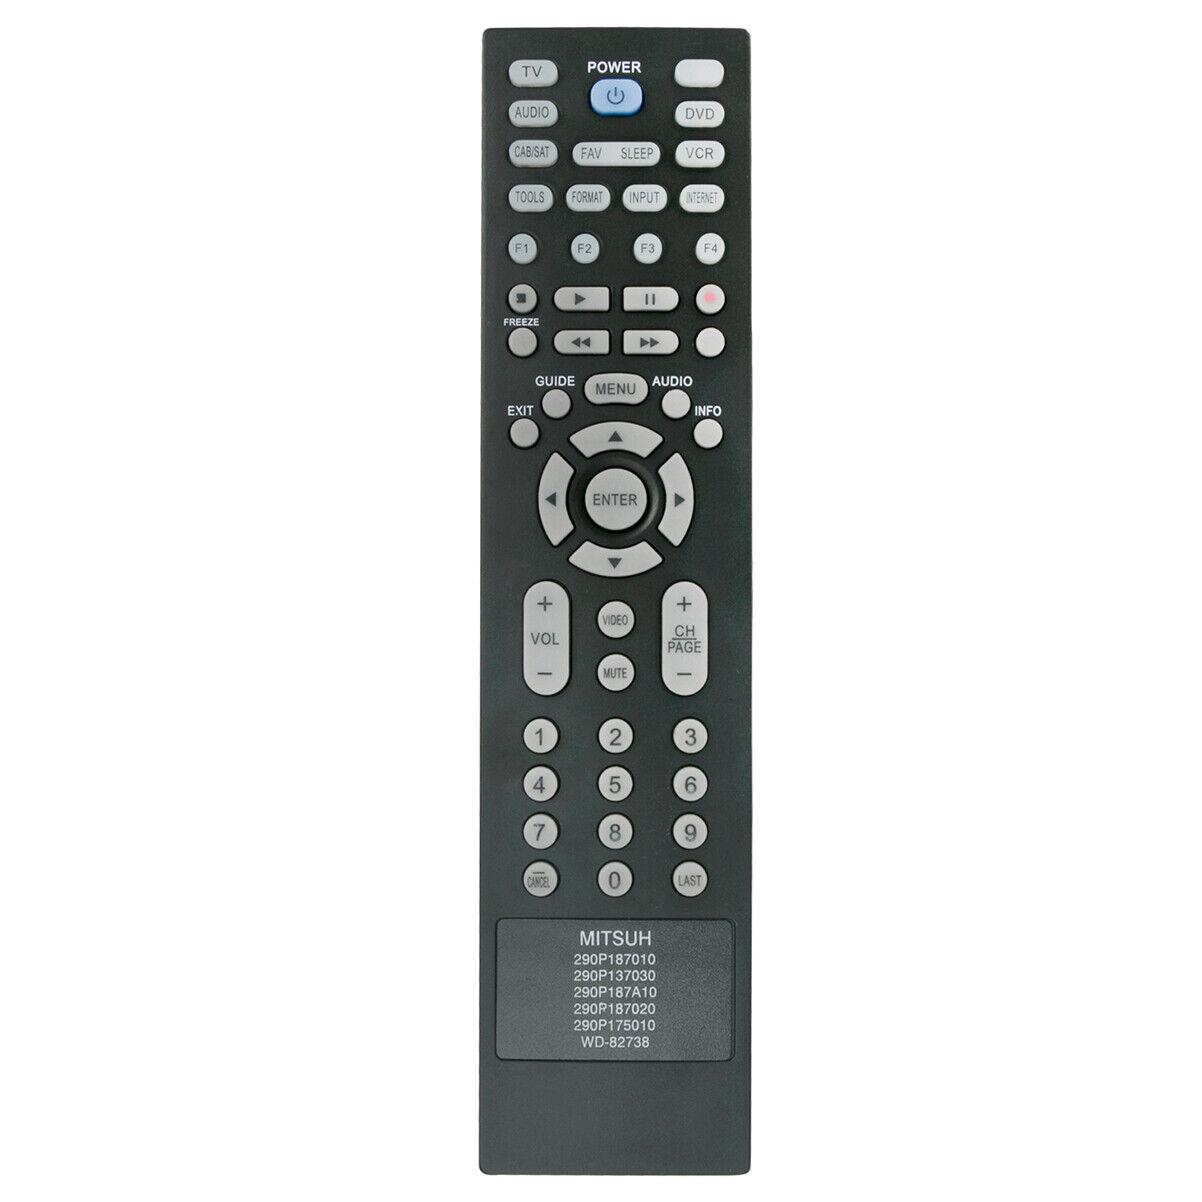 New 290P187A20 290P187020 Replaced Remote for MITSUBISHI TV